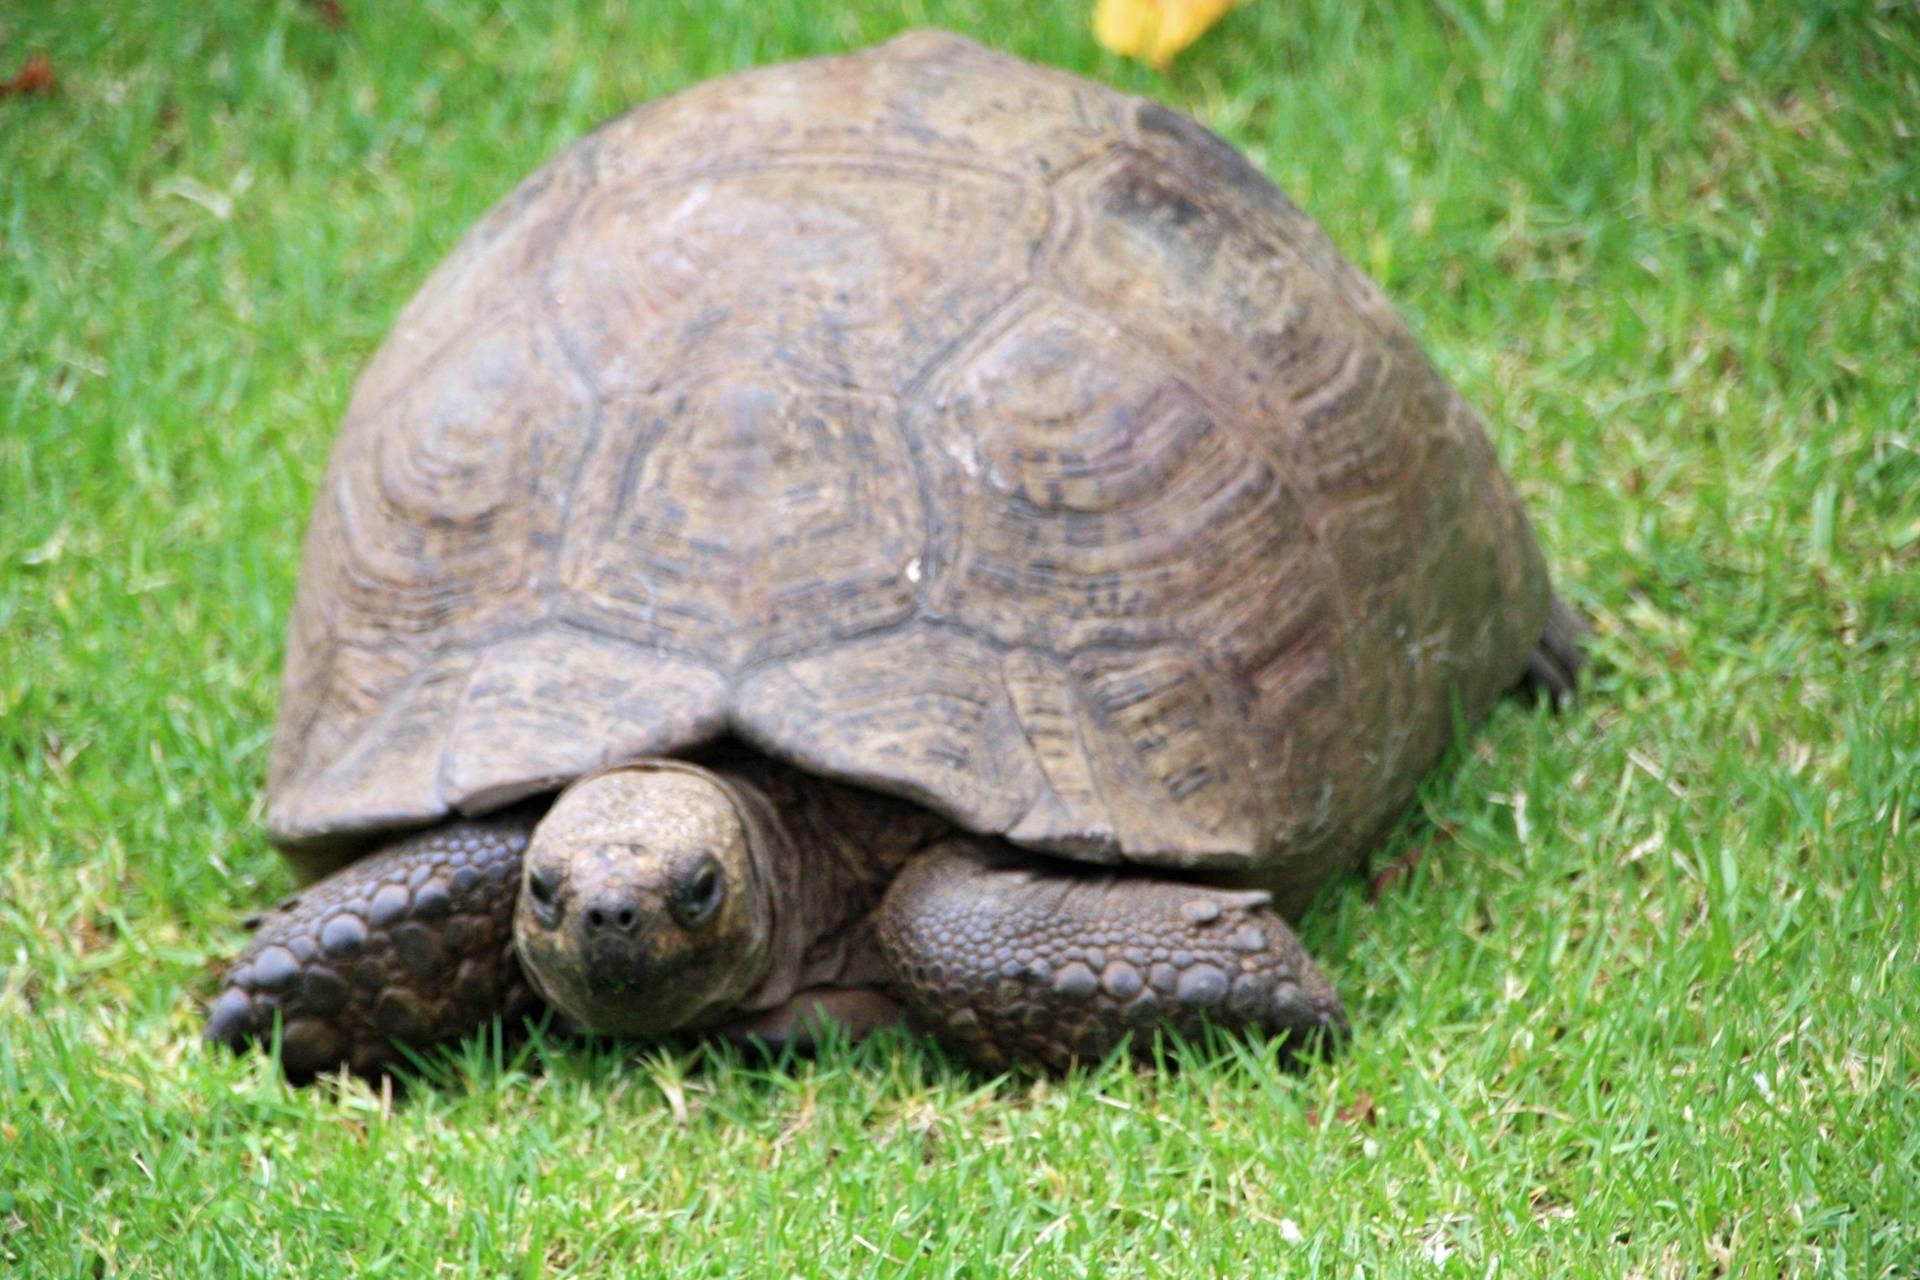 Tortoise at Kirstenbosch Botanical Gardens, Cape Town